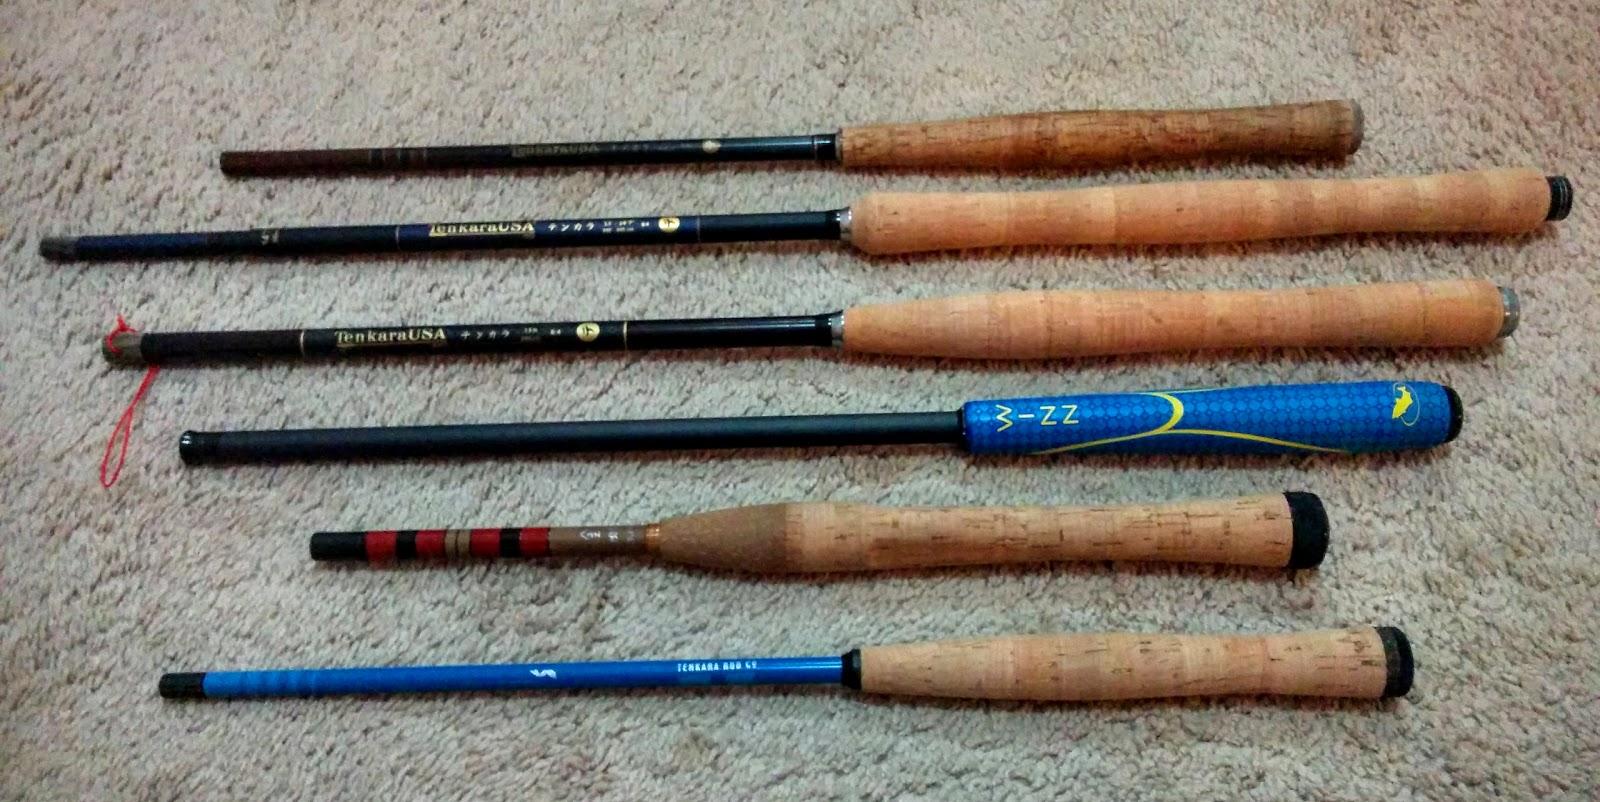 Tenkara tuesday my fab five tenkara rods article tue for Tenkara fishing rods